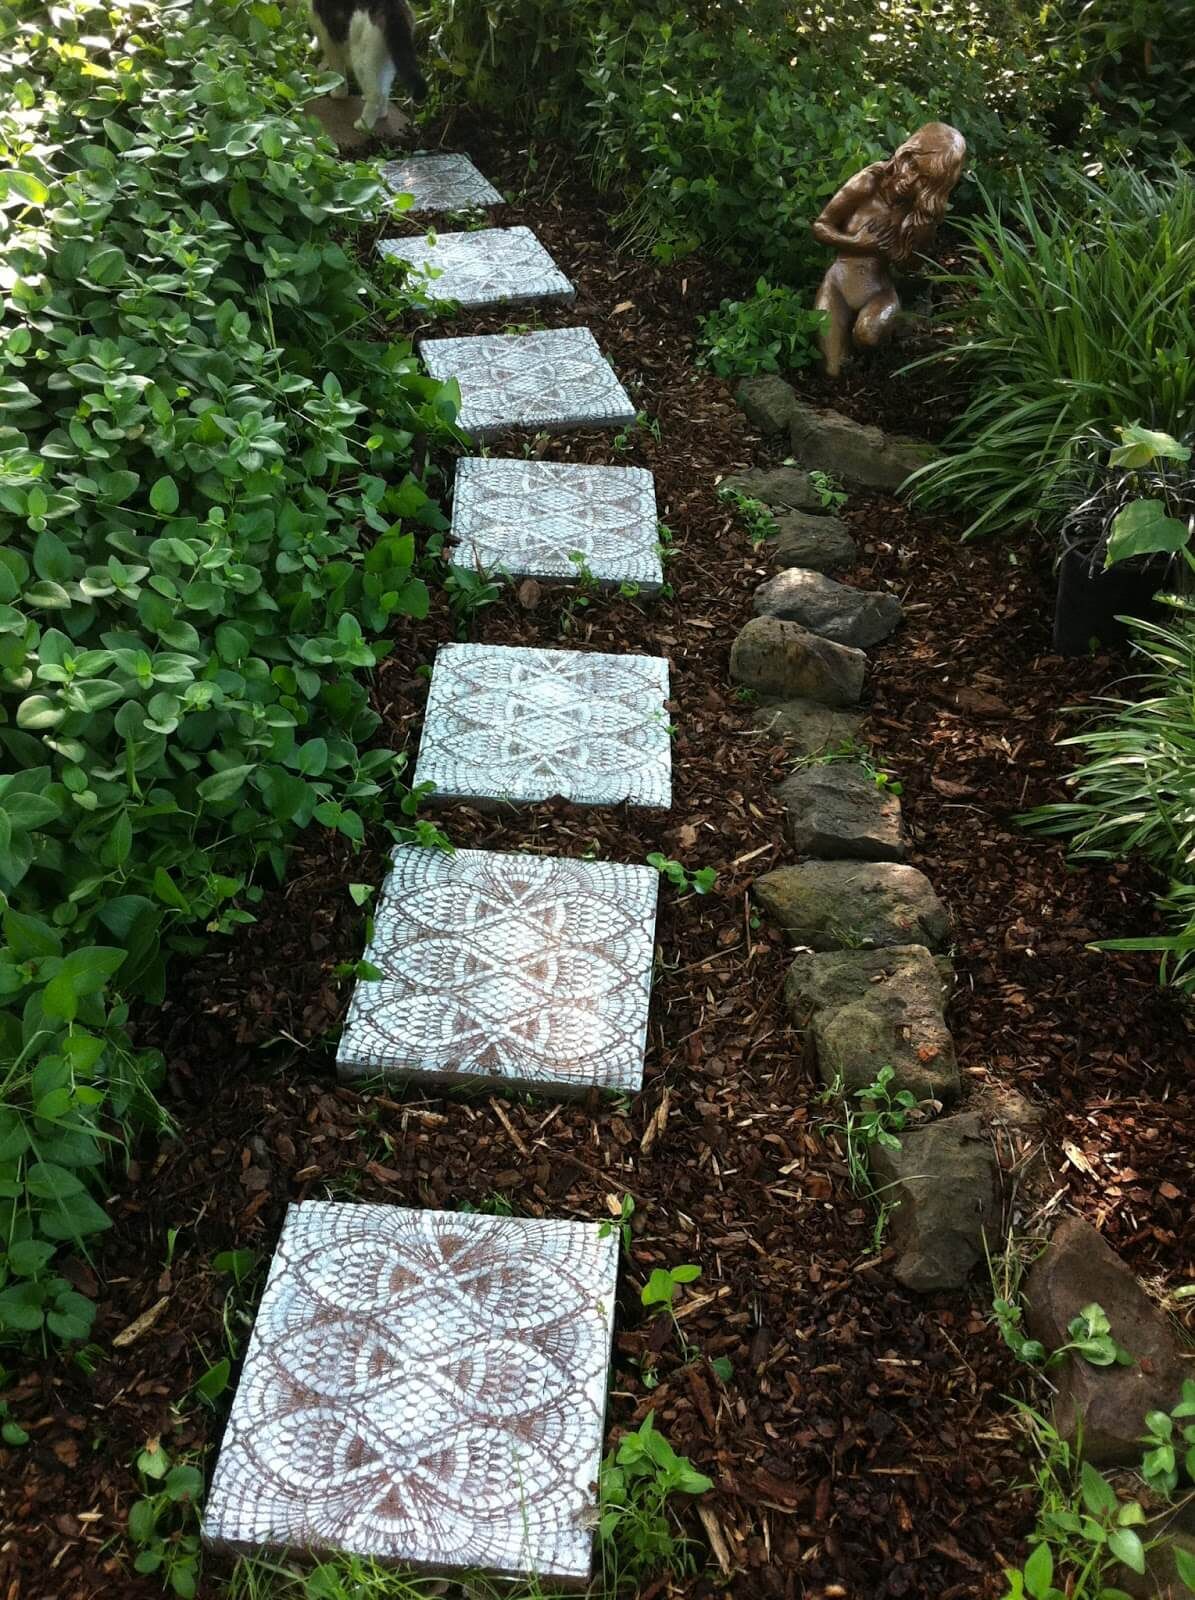 Show Off Custom Tiles Against Dark Mulch